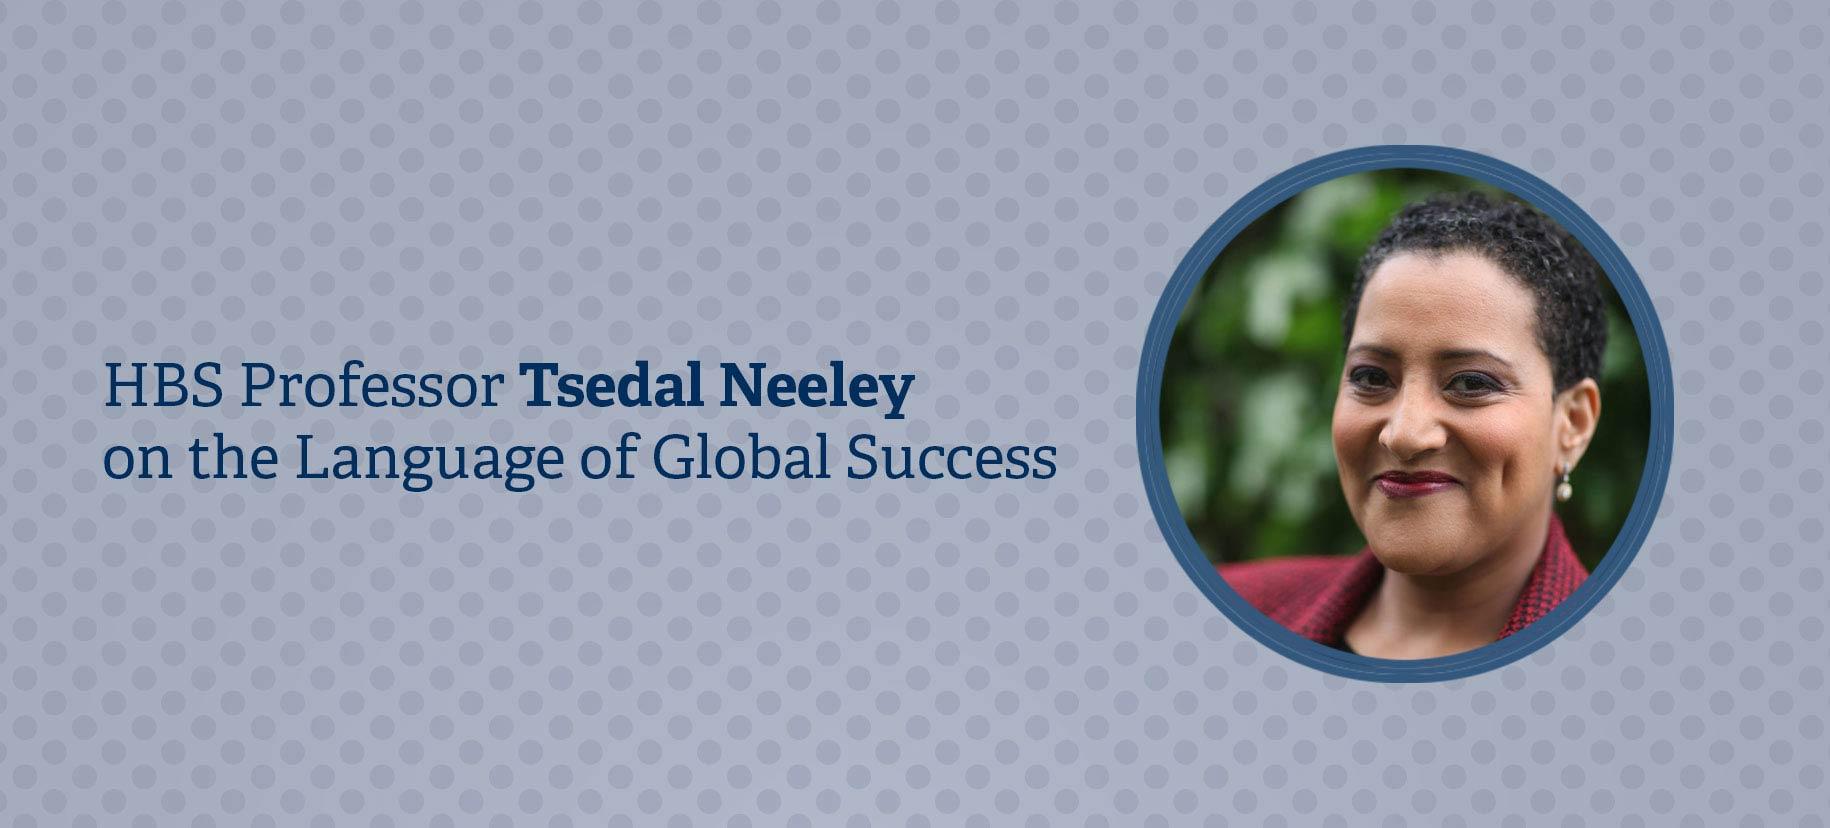 Tsedal-Neeley-interview.jpg